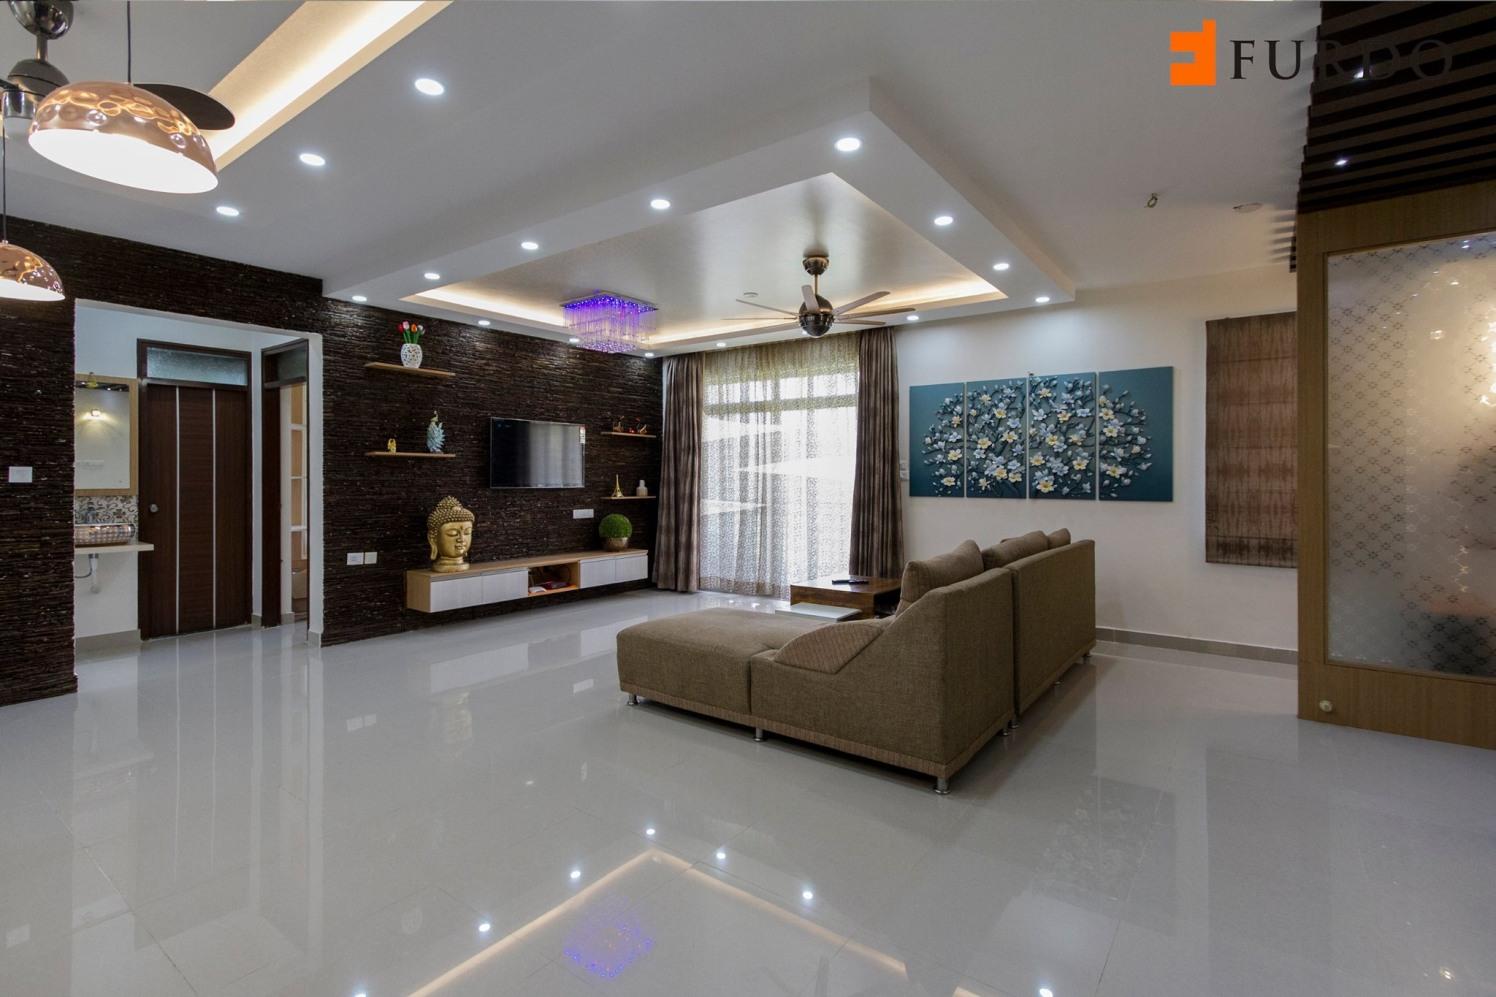 Living Room With Marble Flooring And Modern False ceiling by Furdo.com Living-room Modern   Interior Design Photos & Ideas